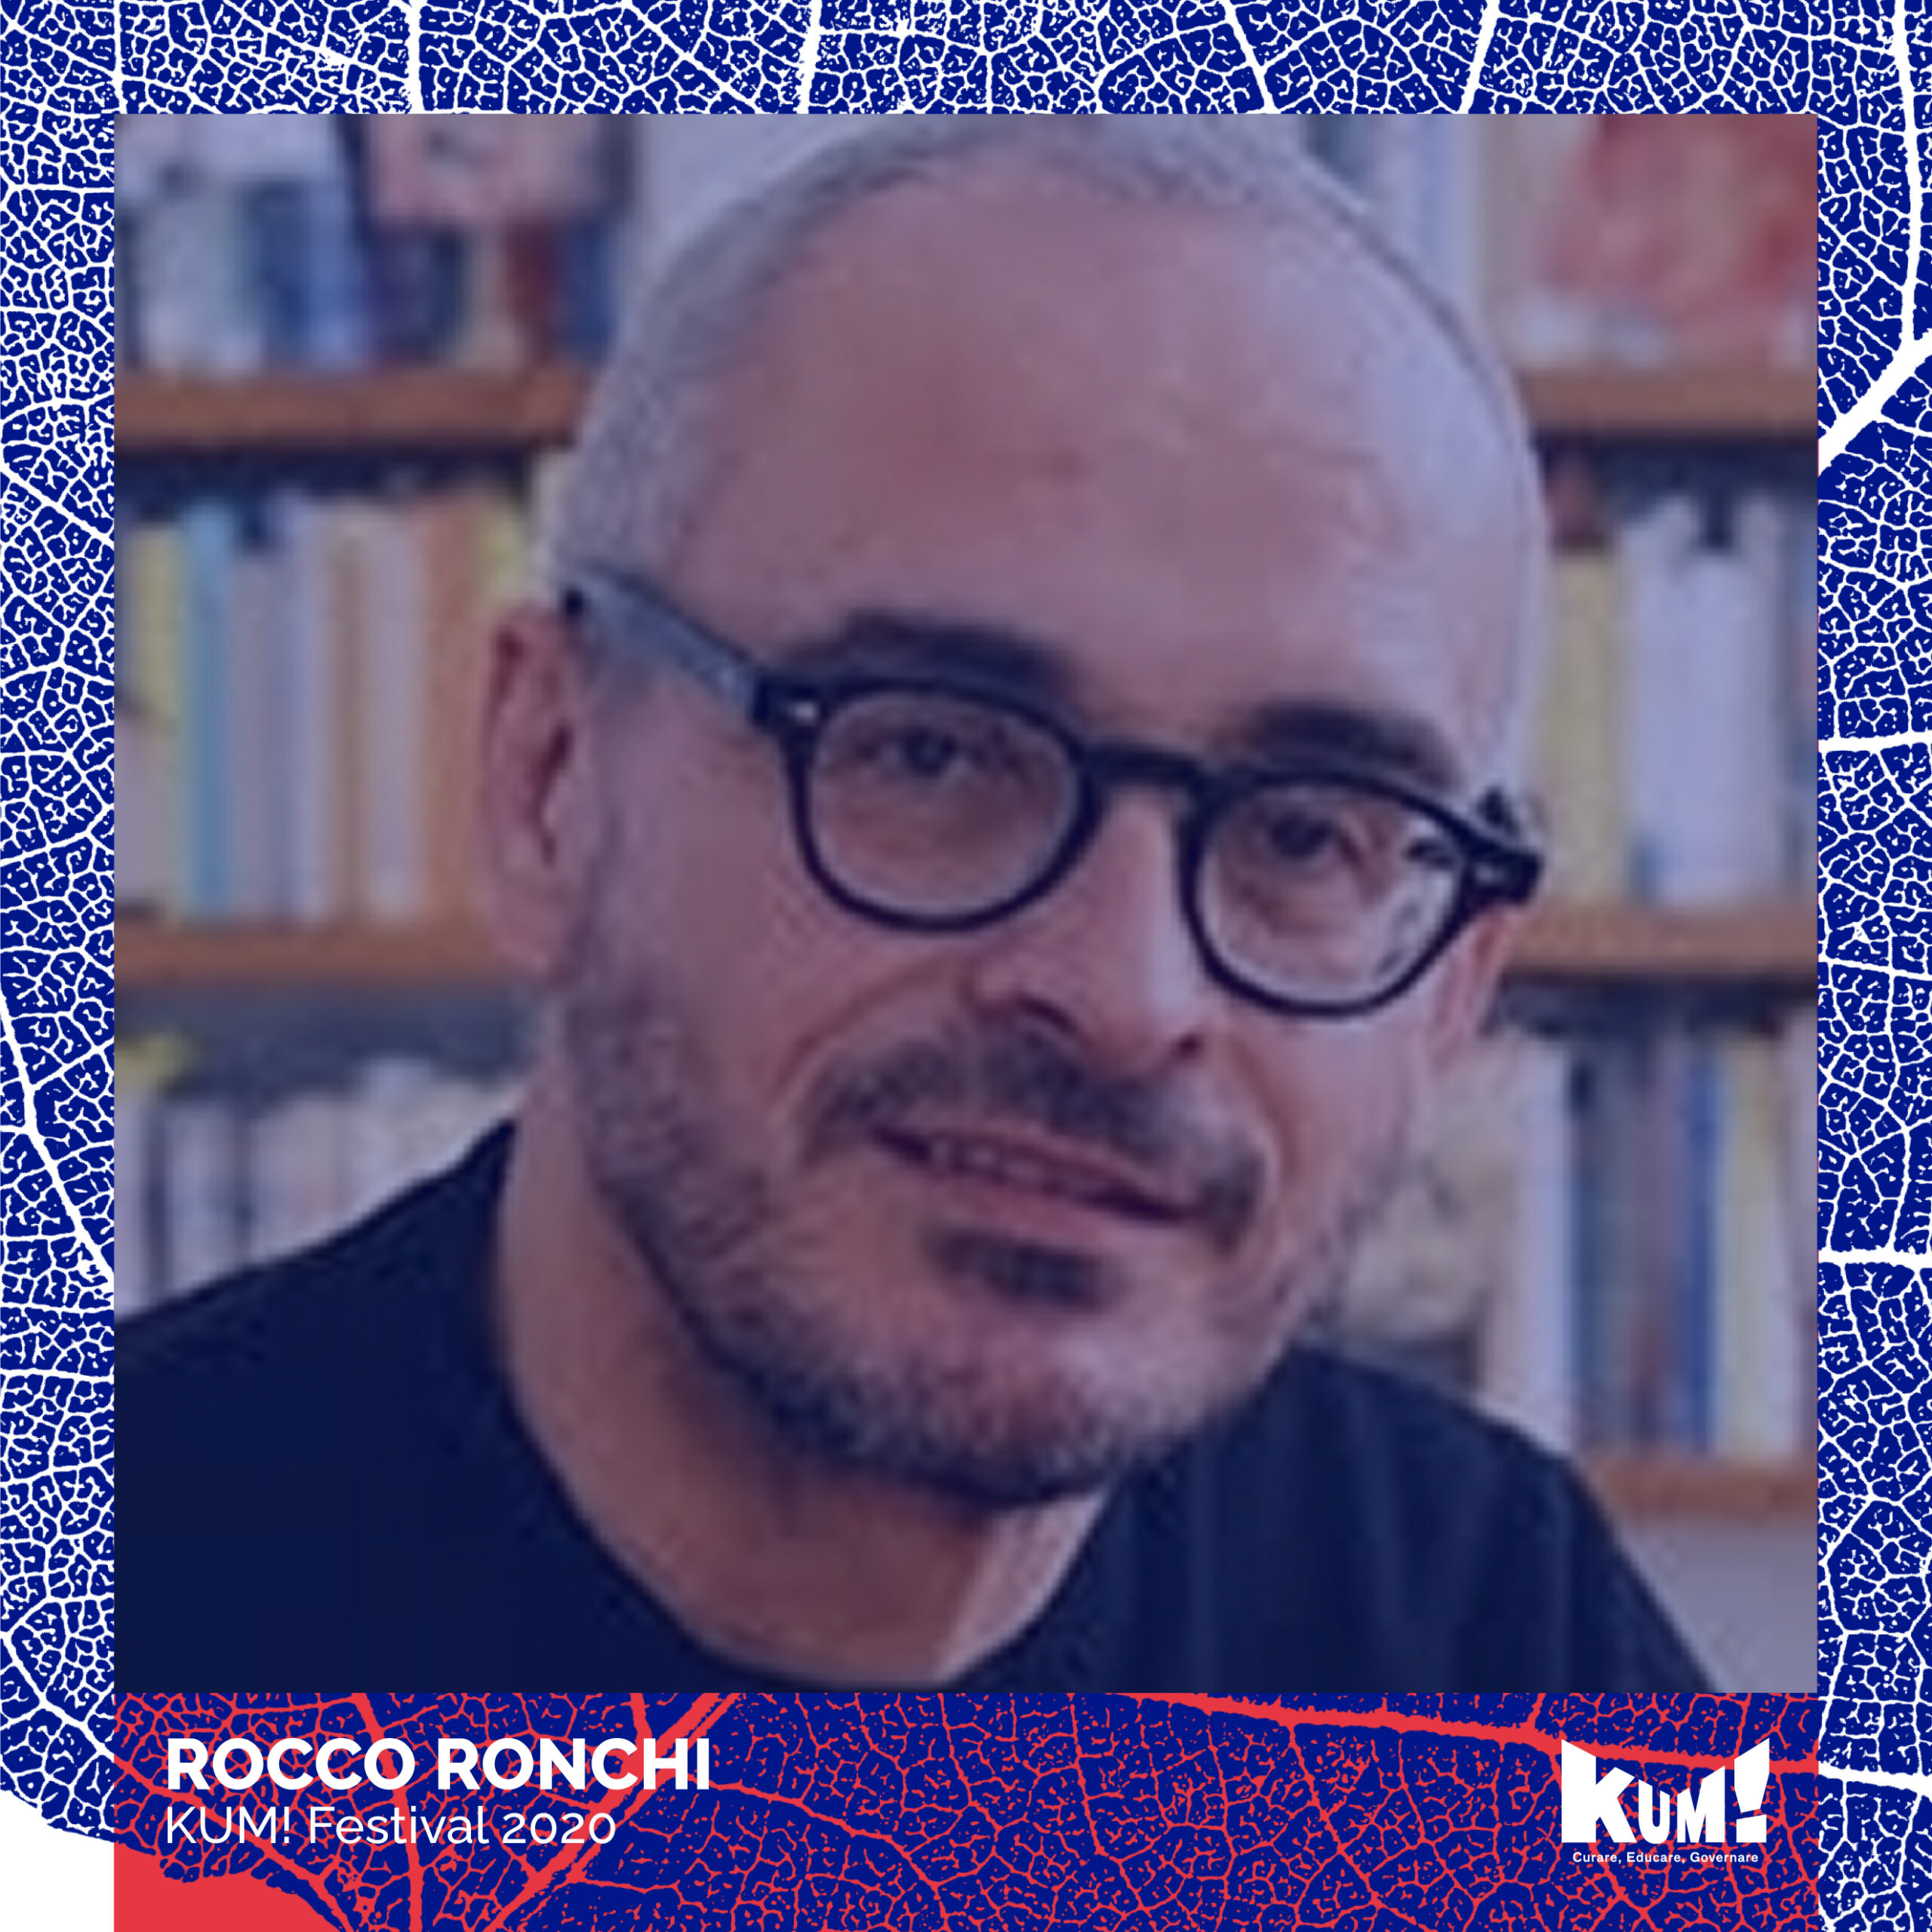 Rocco Ronchi